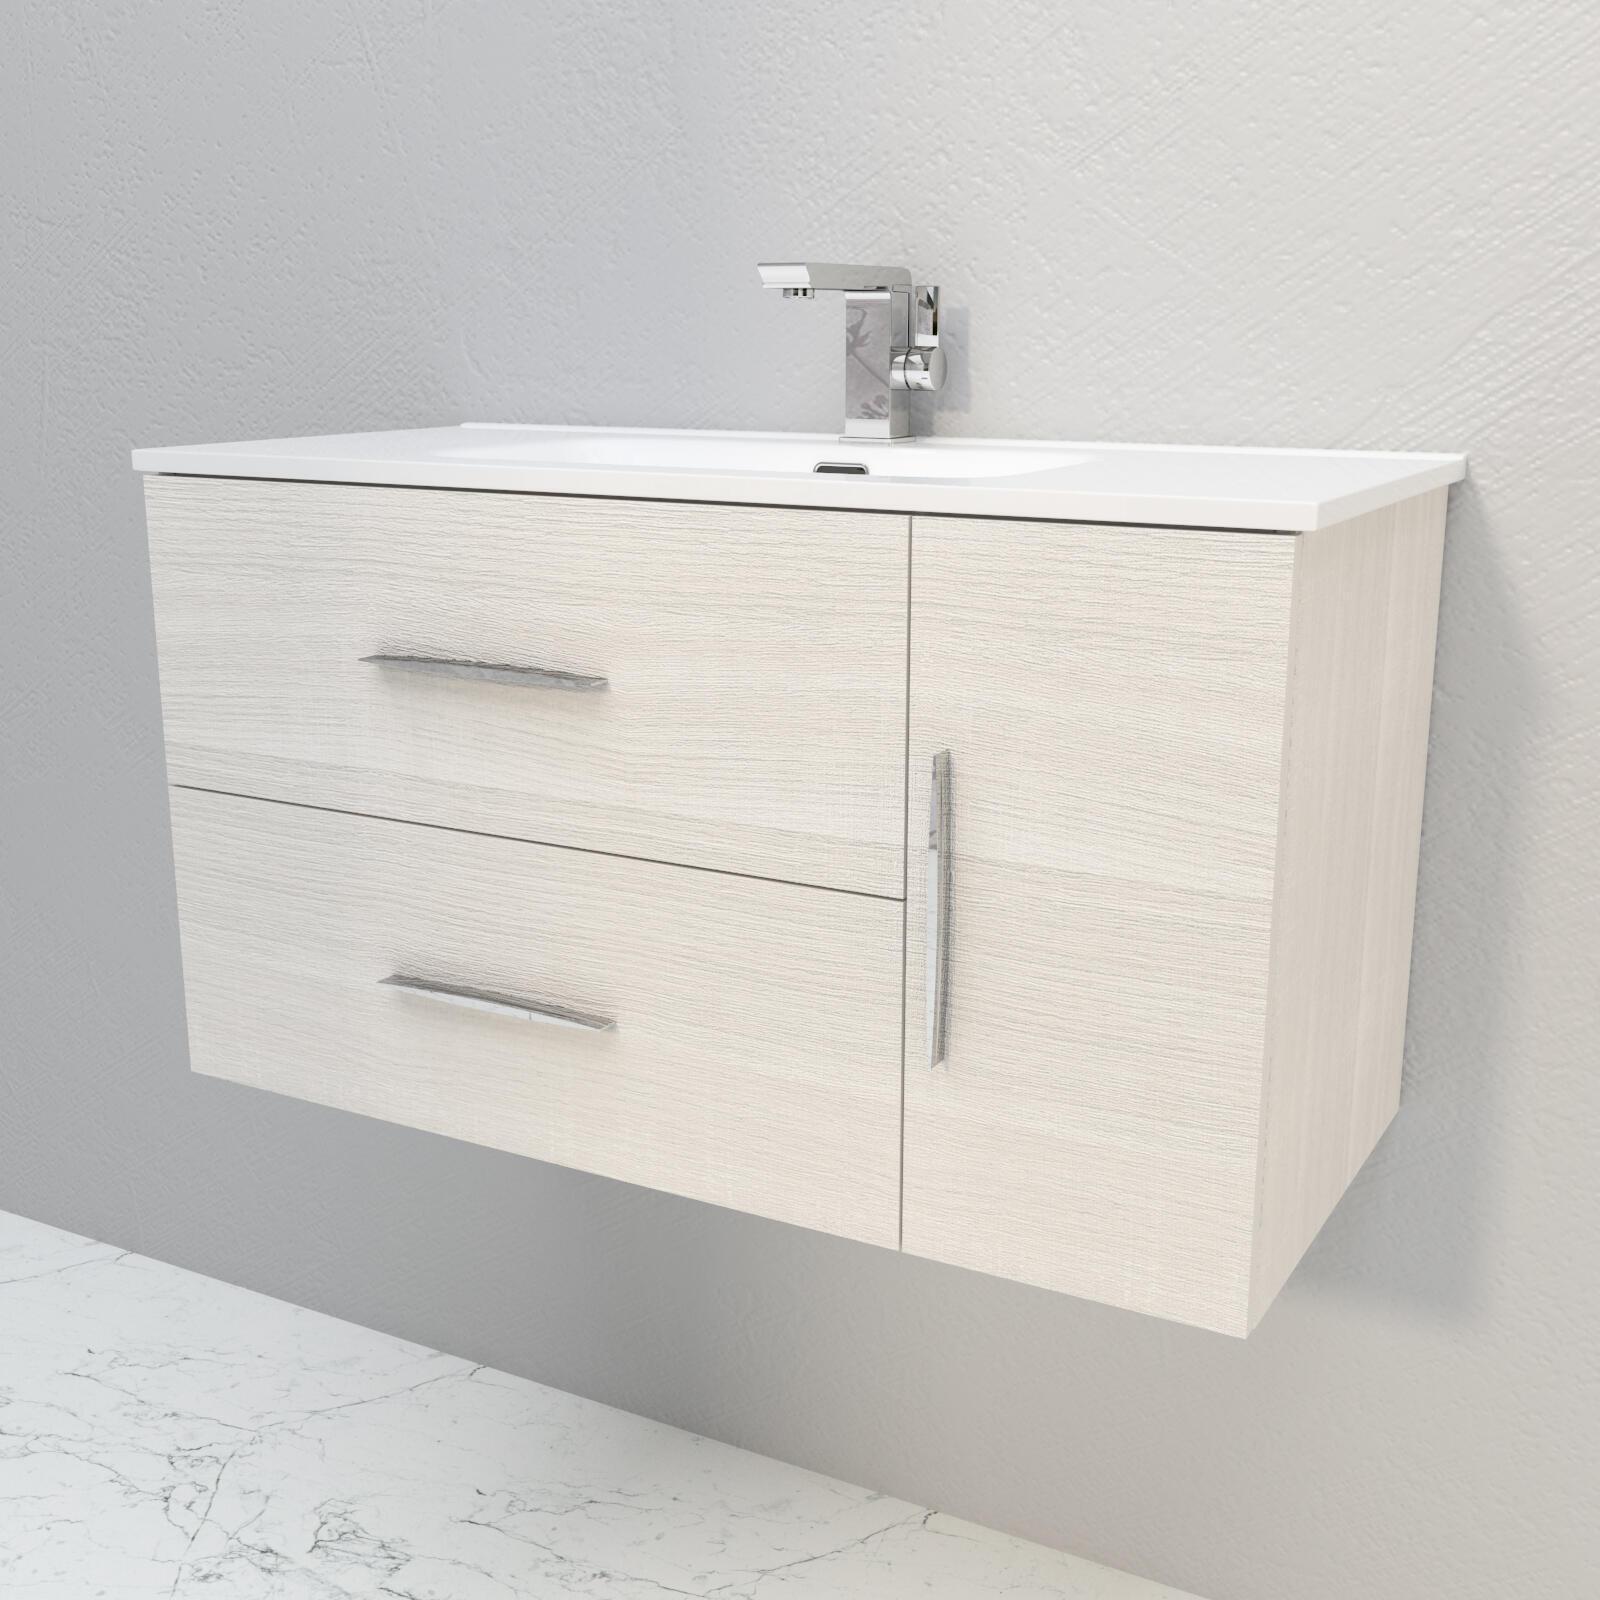 Mobile bagno Master bianco rock L 100 cm